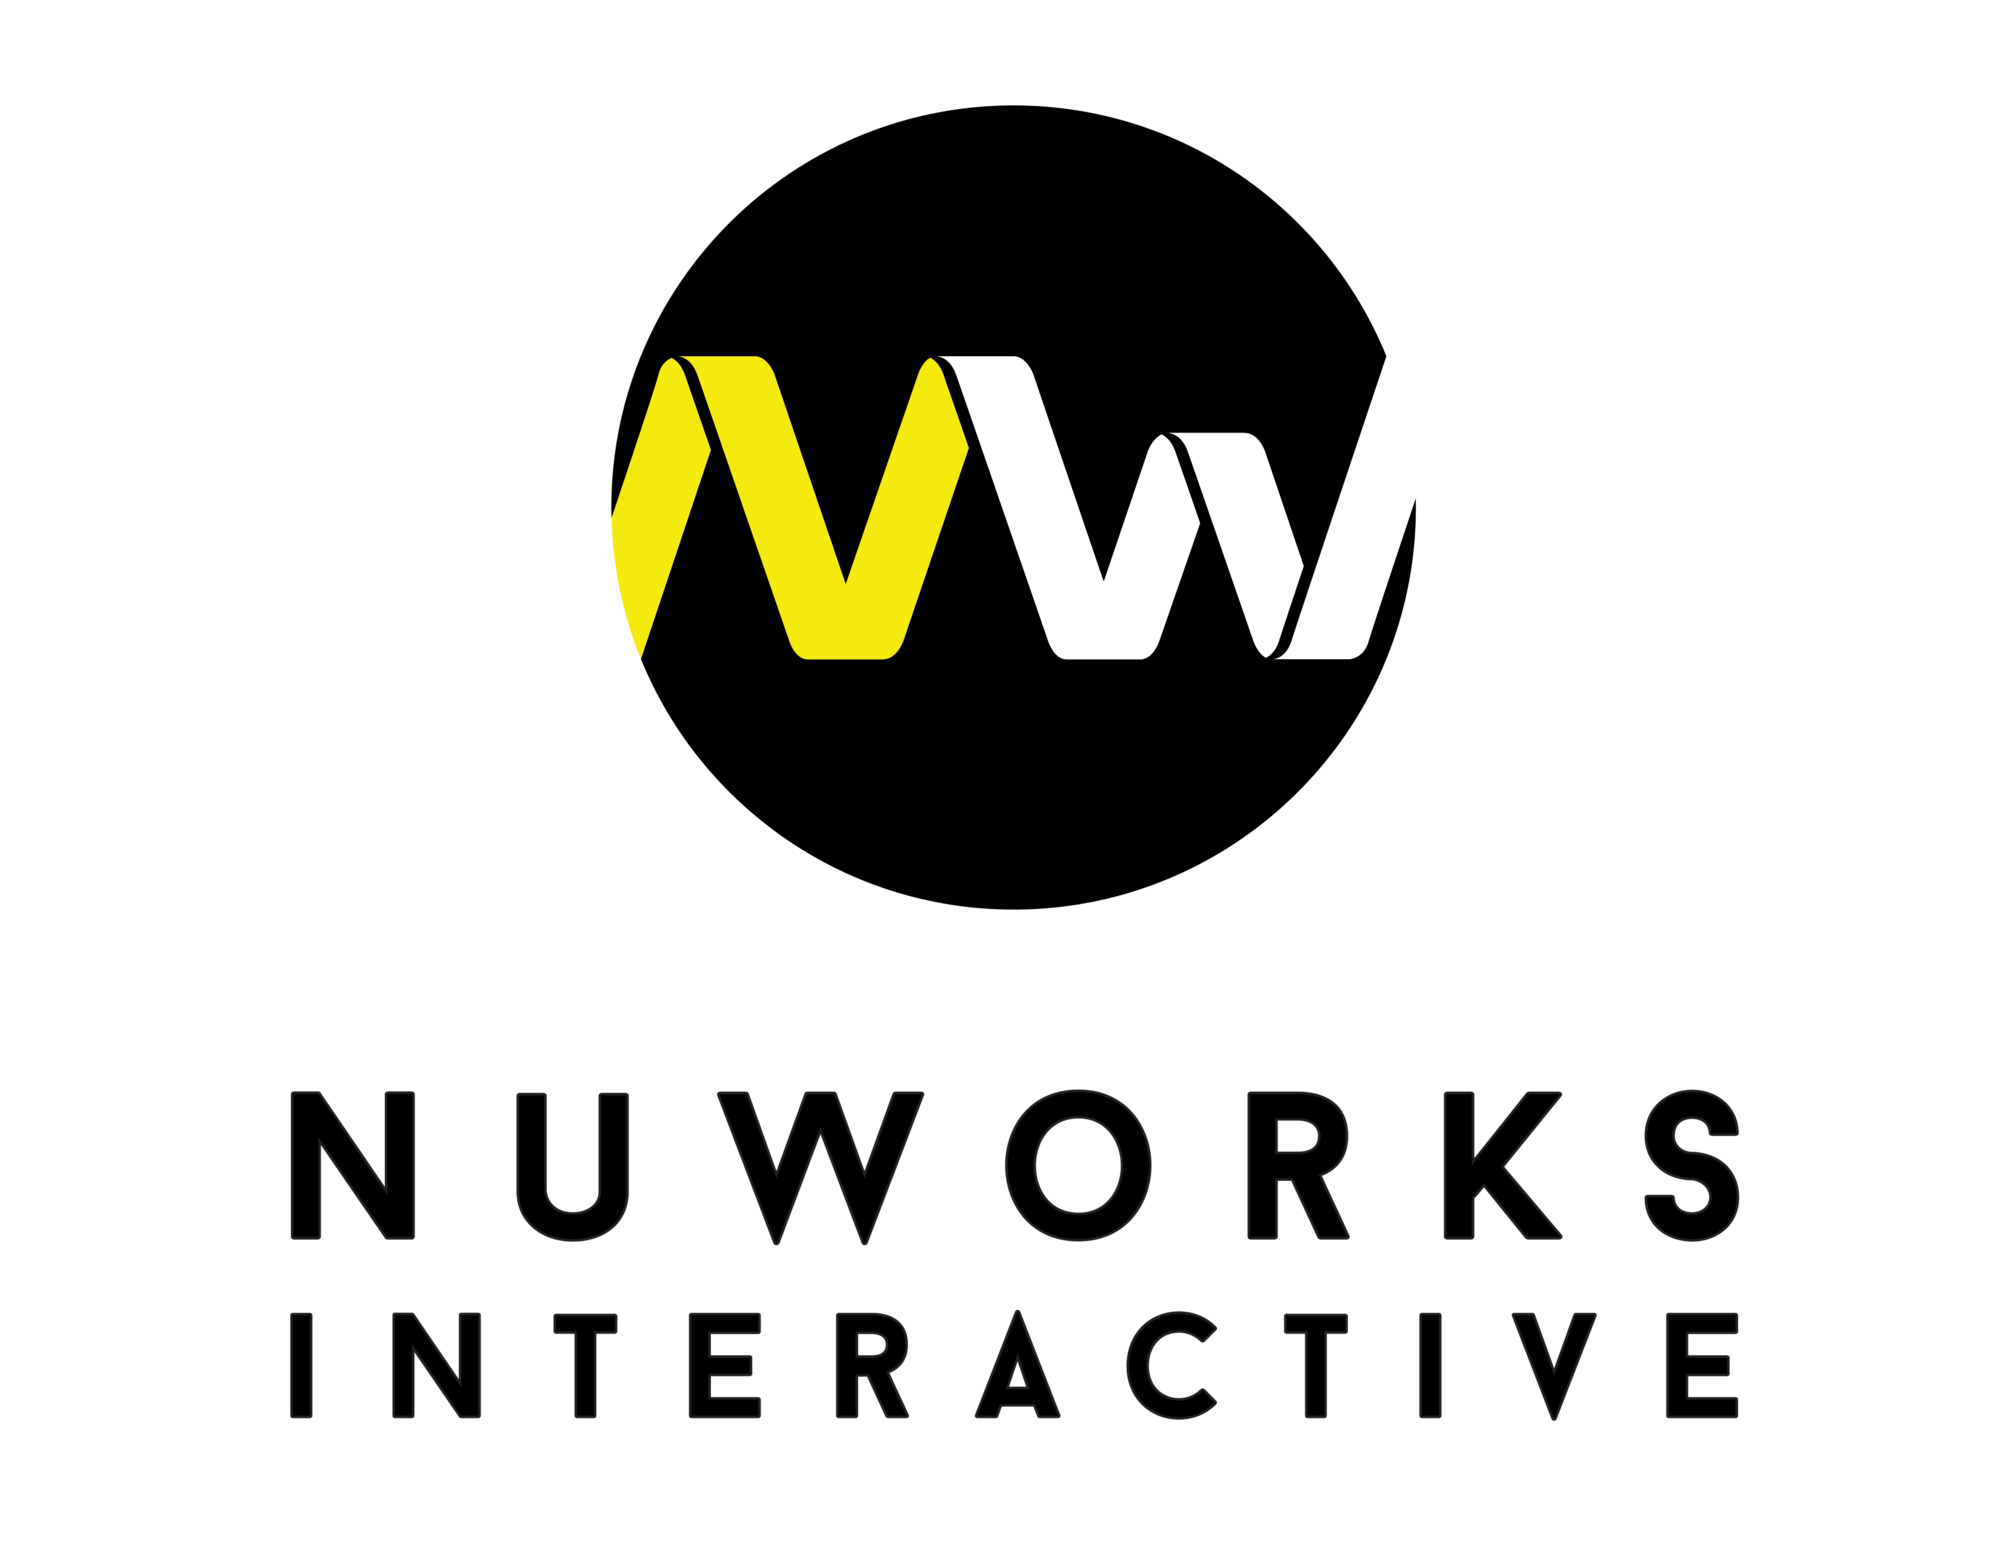 Nuworks Interactive